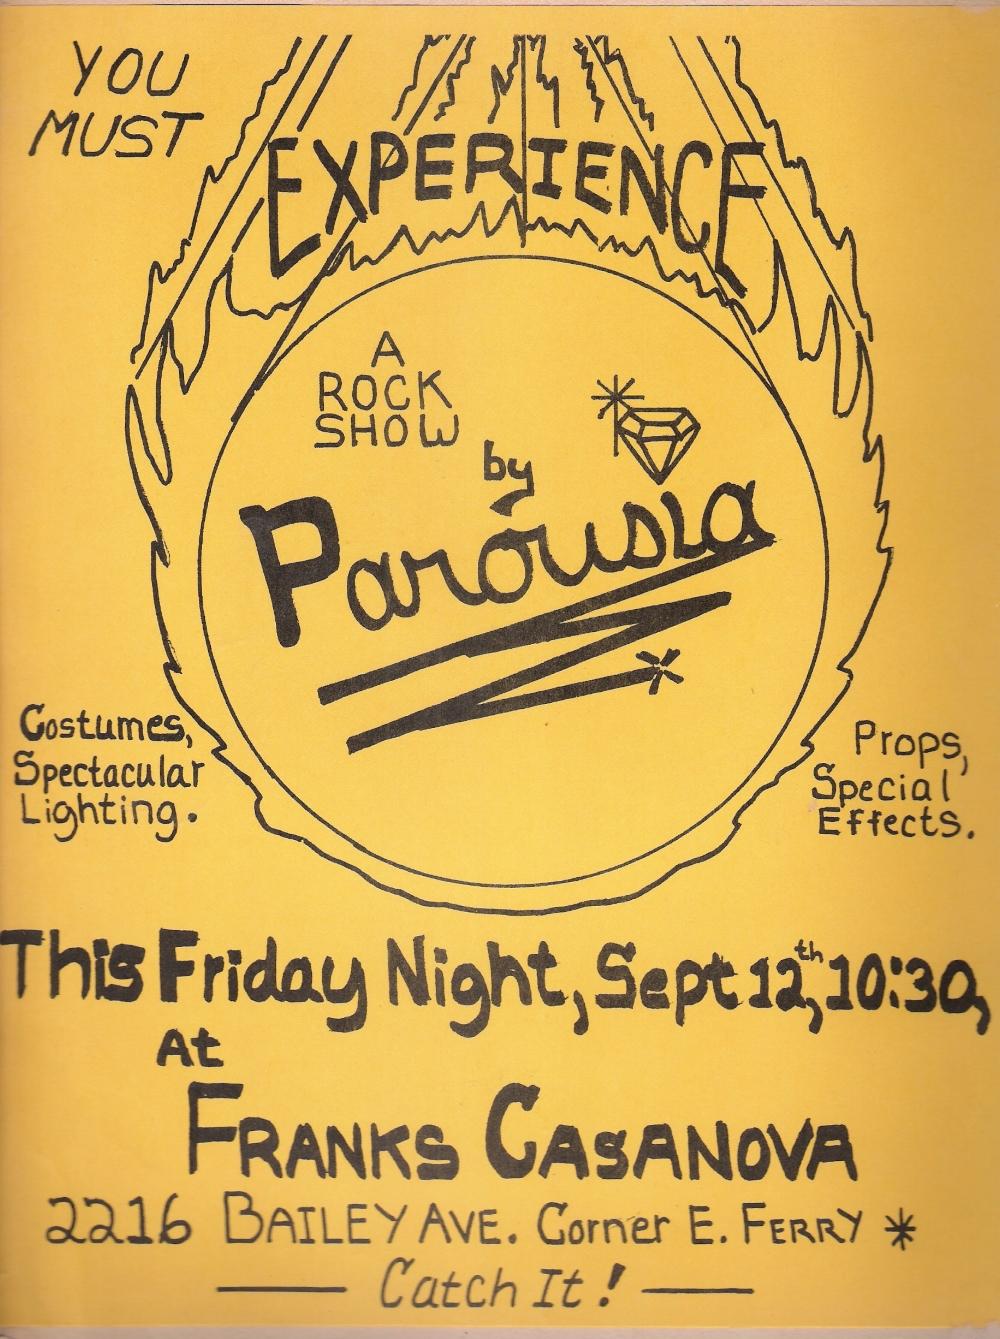 Parousia band flyer: Frank's Casa Nova - September 12, 1980